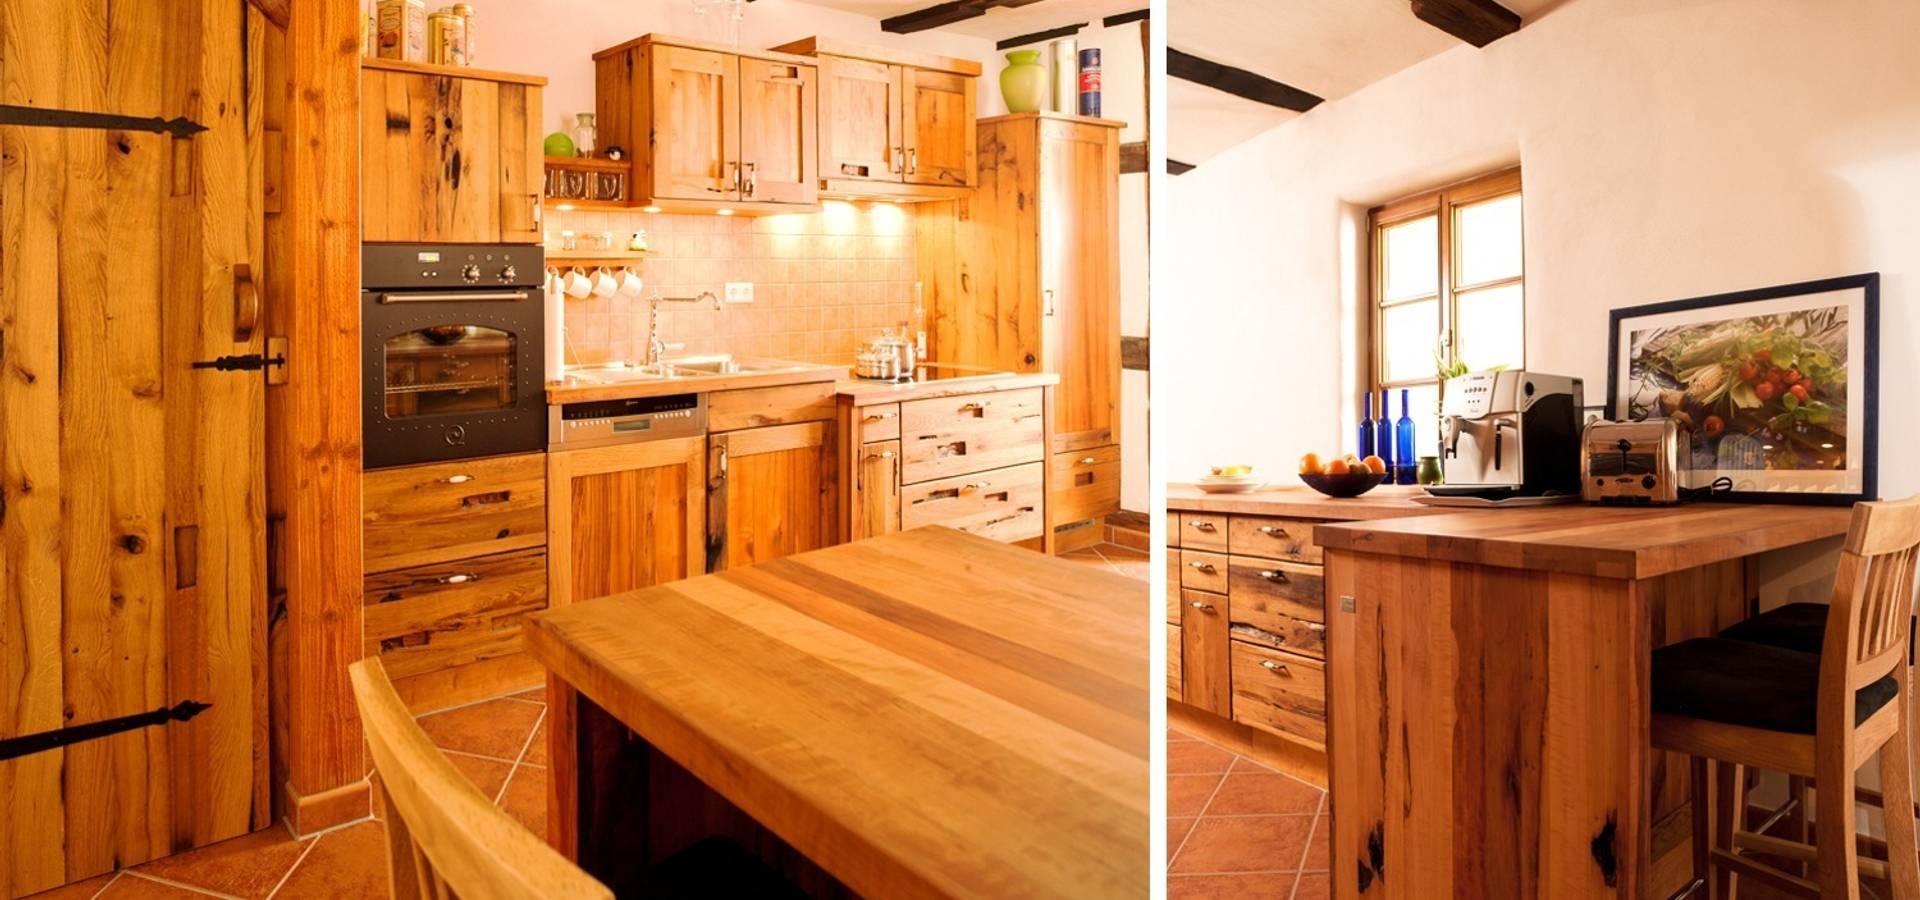 Runde kuche de pfister mobelwerkstatt gdbr homify for Runde küche